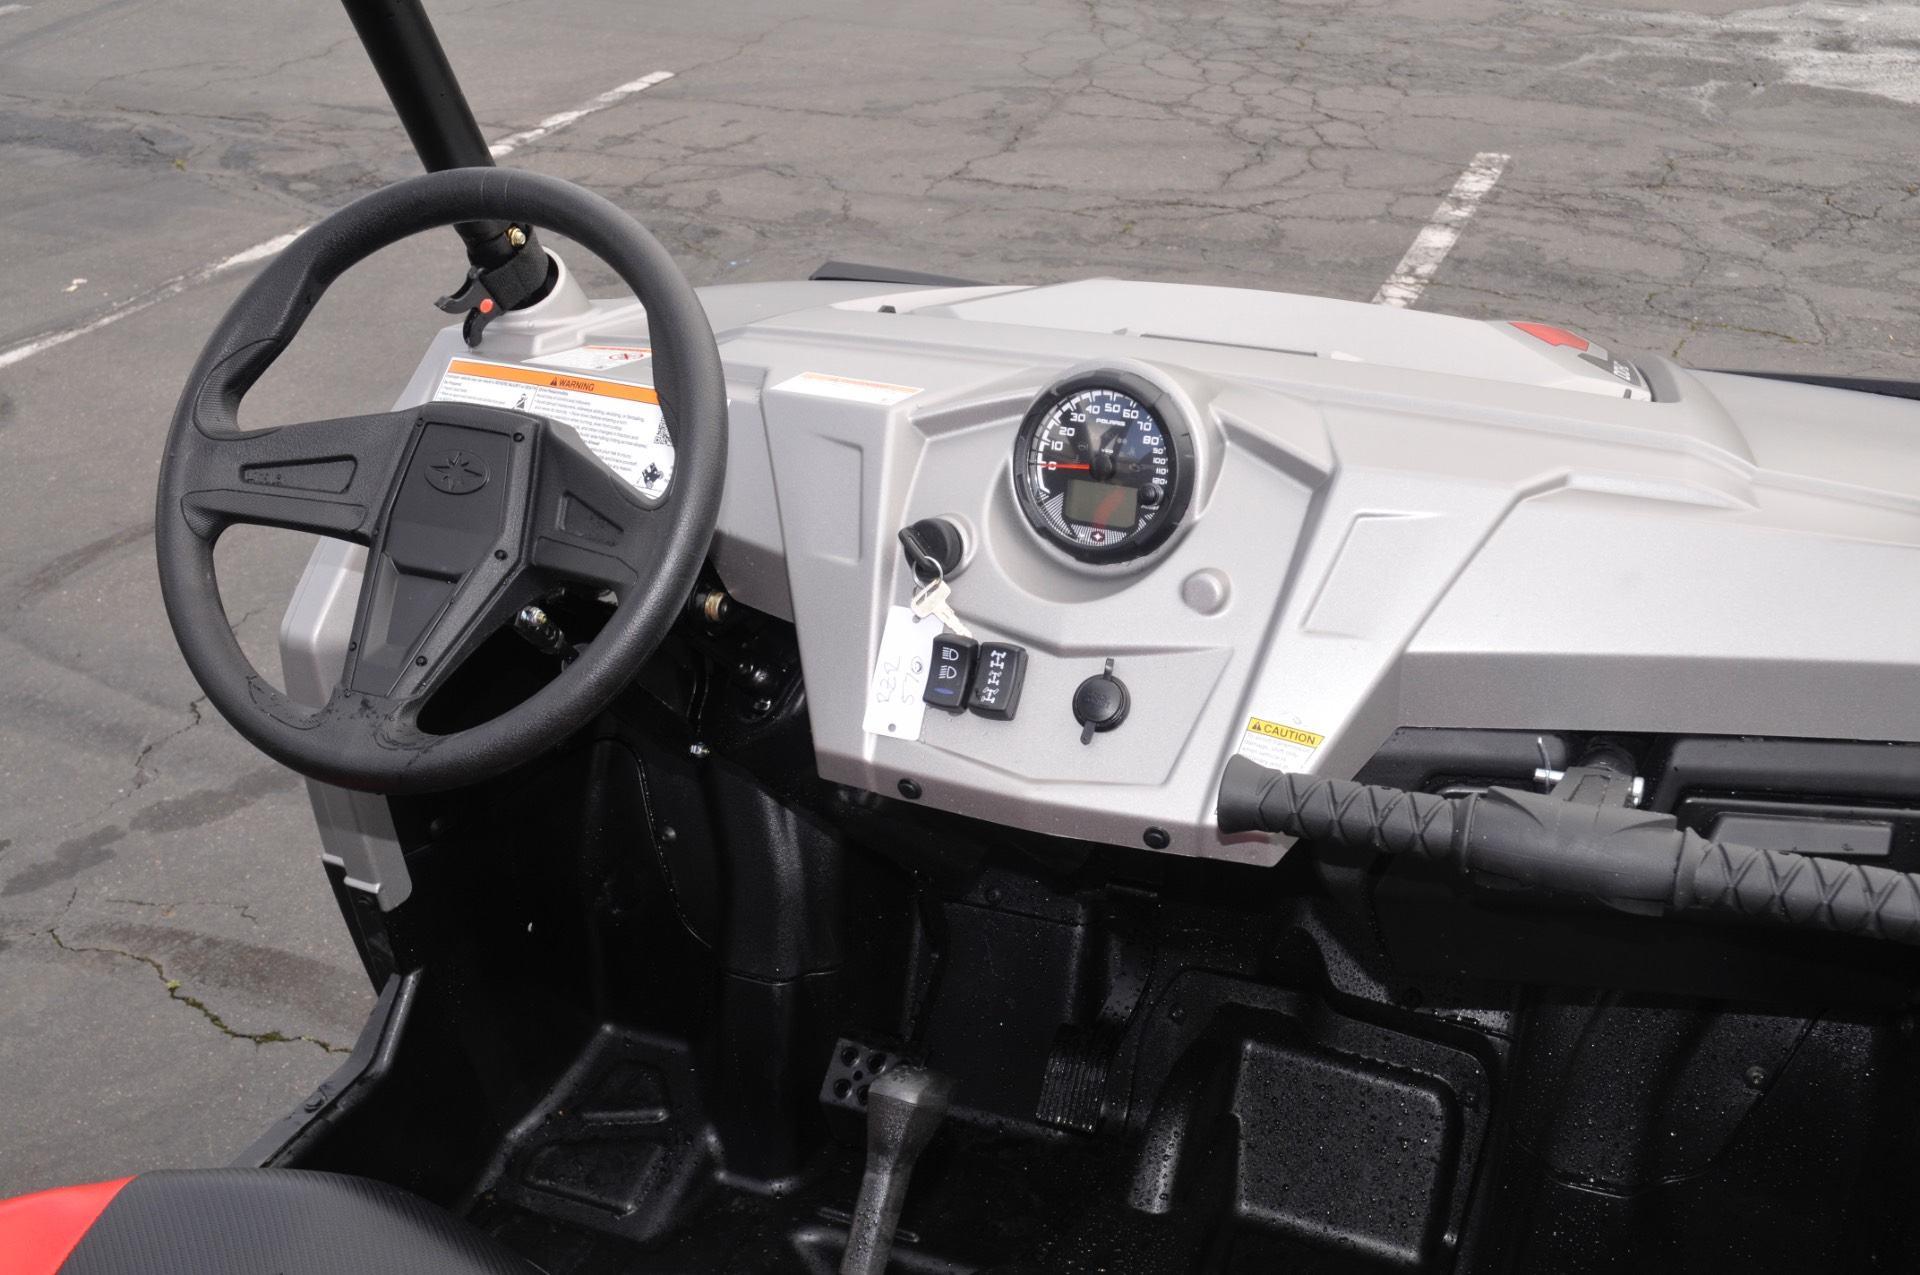 2017 Polaris RZR 570 EPS in Roseville, California